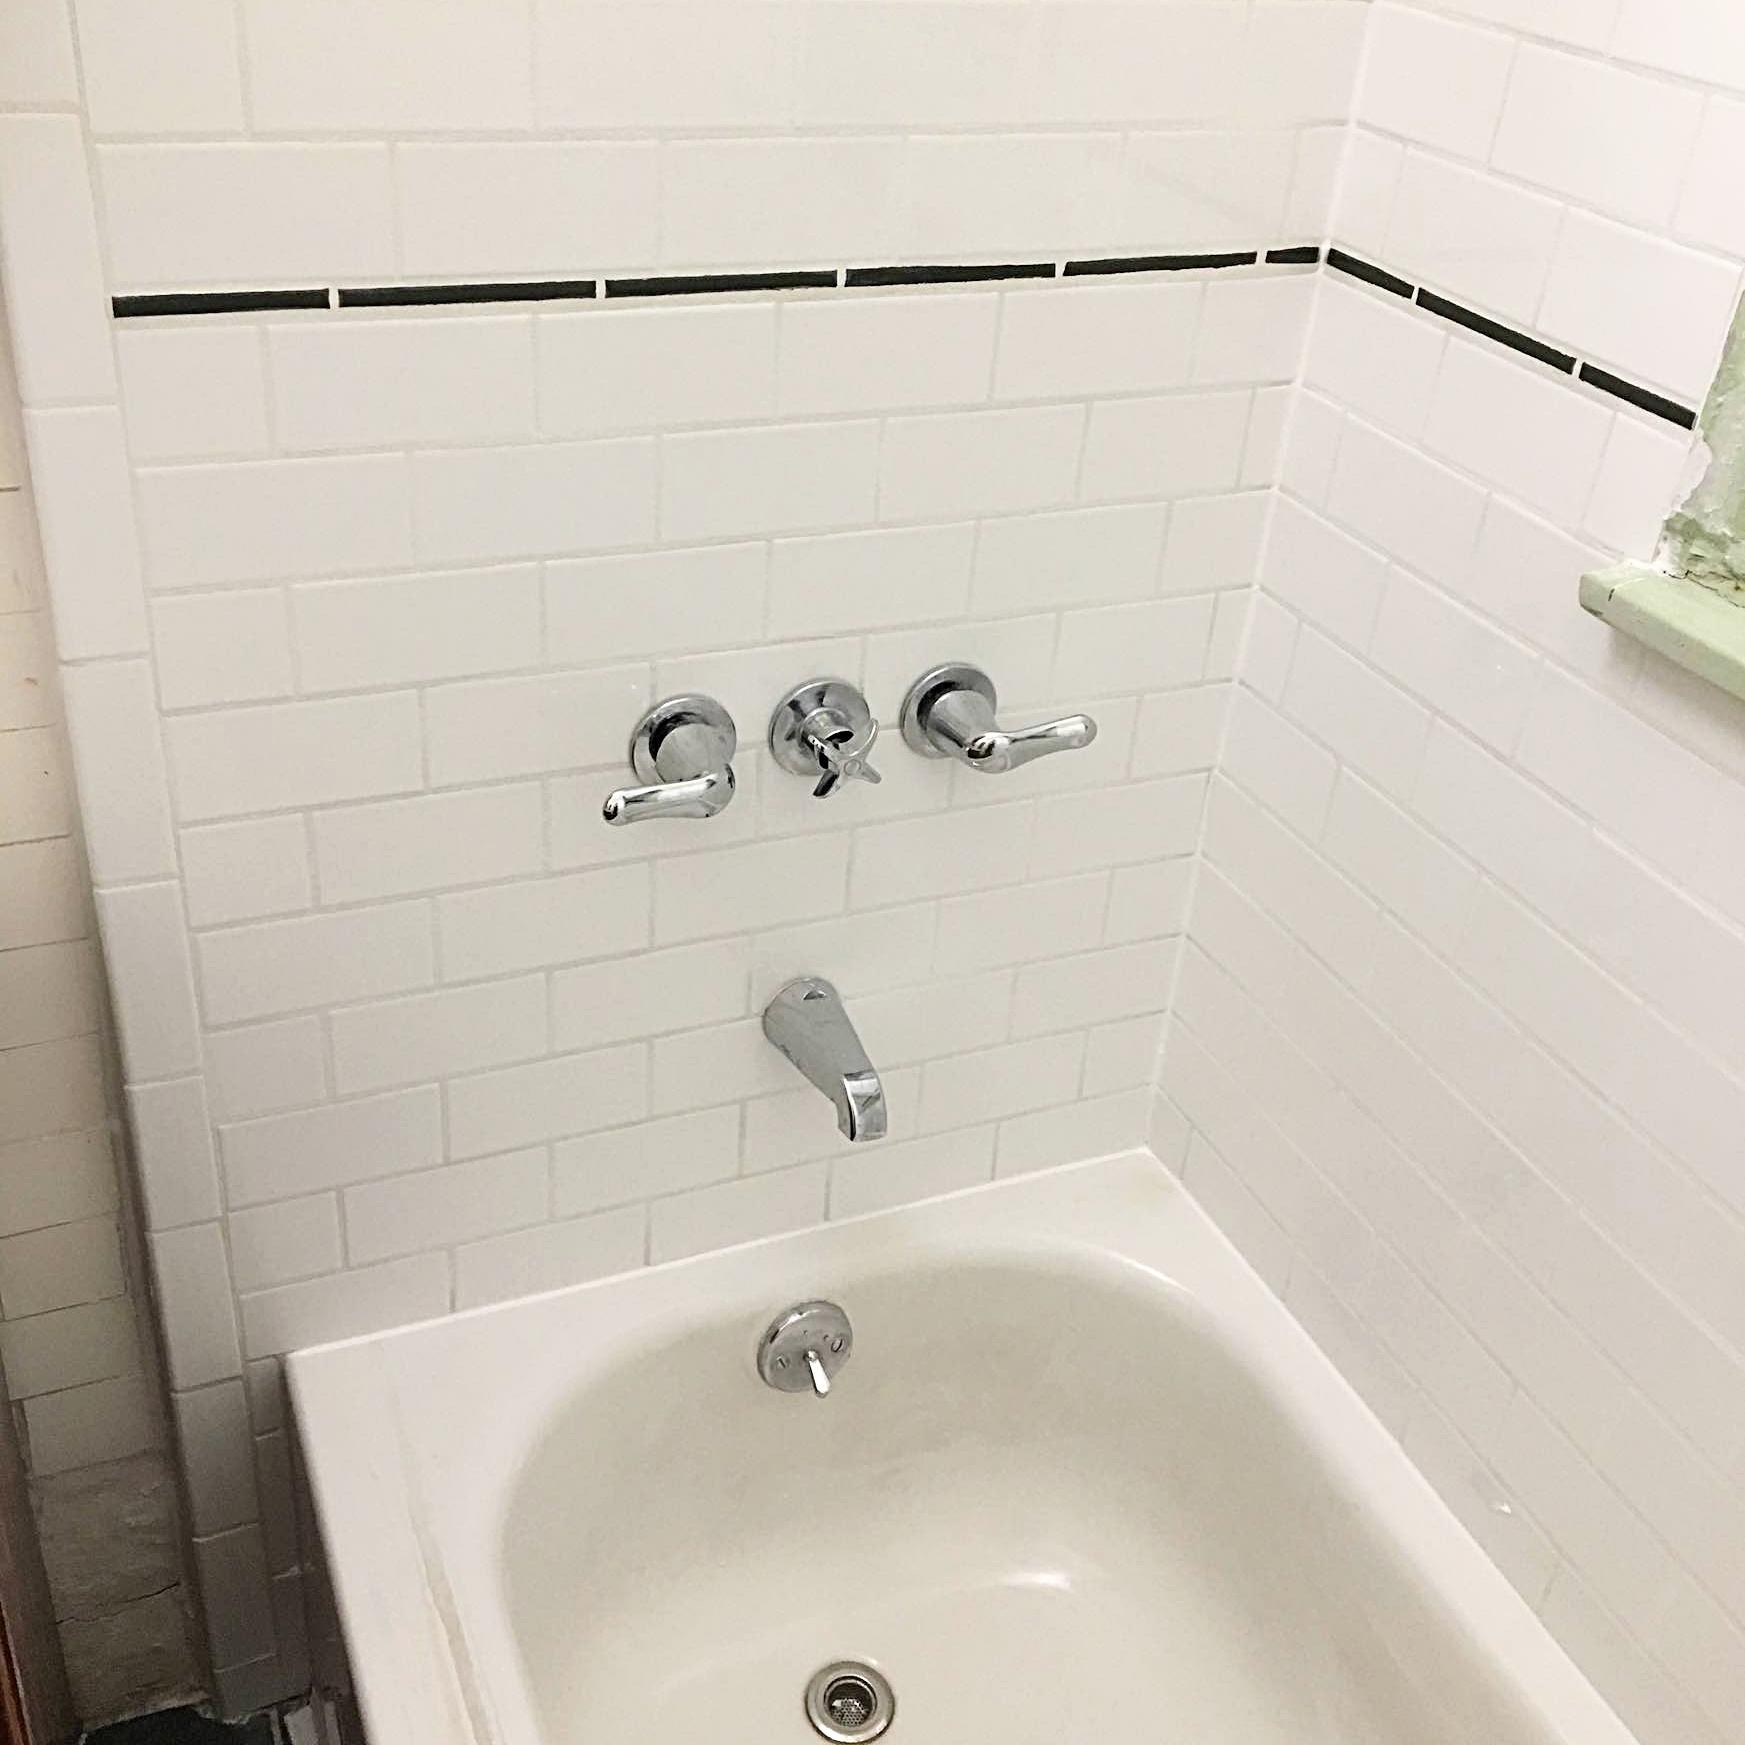 Bathtub surround tiling renovation, Brooklyn, NY